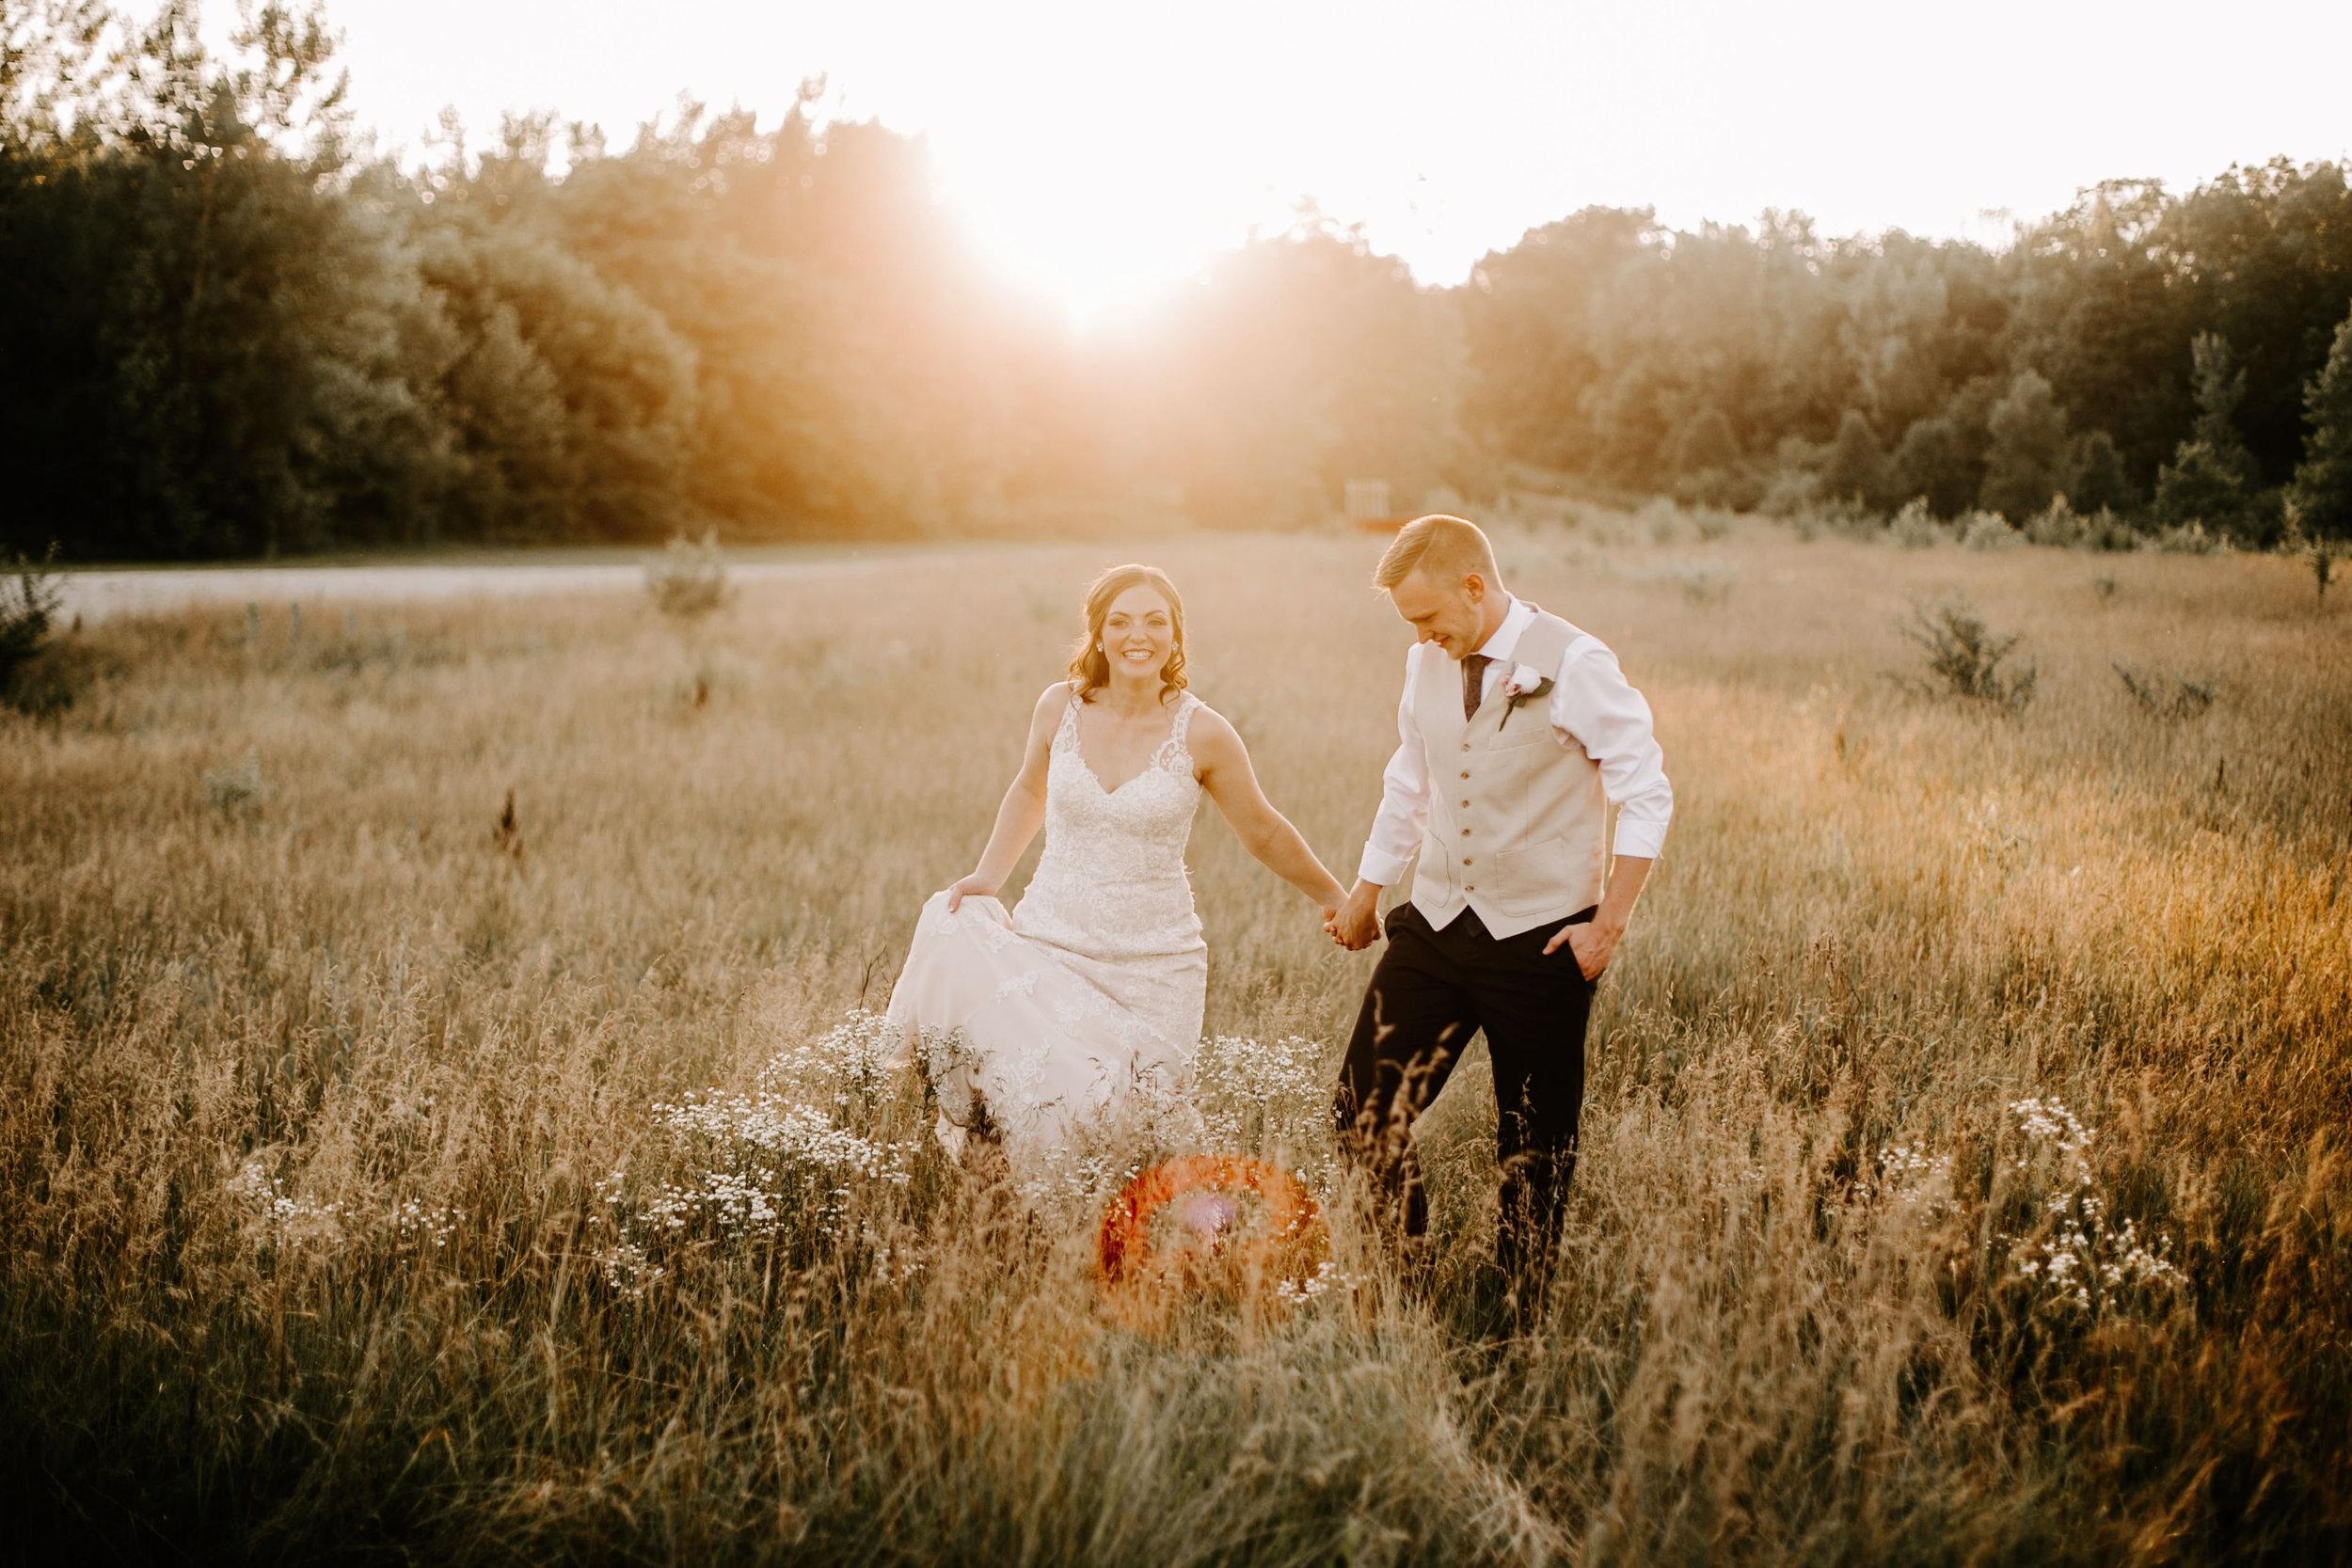 Payton_and_Austin_Avon_Indiana_Wedding_Emliy_Elyse_Wehner_Photogrpahy-830.jpg